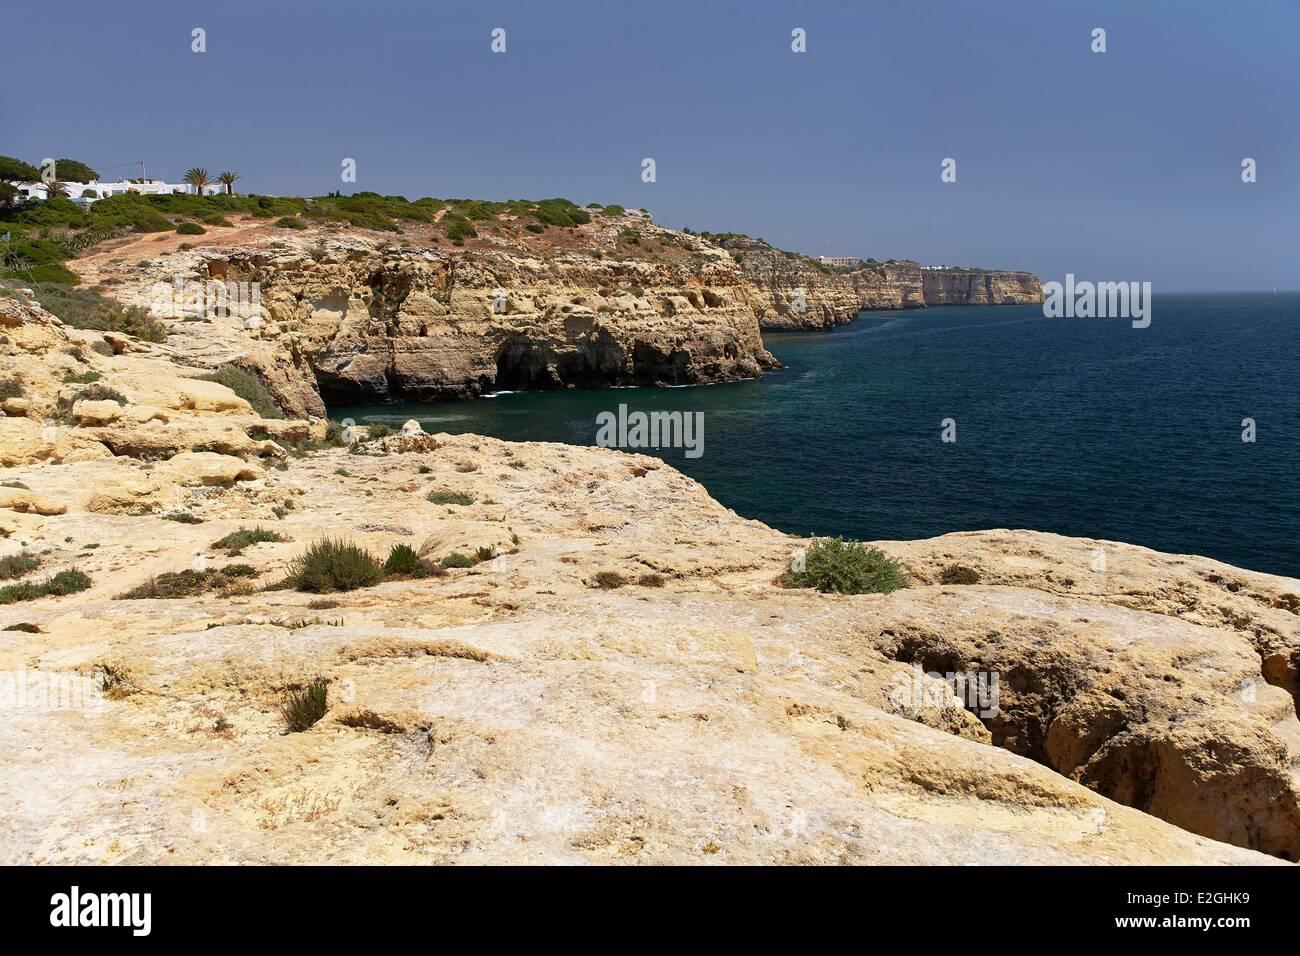 Portugal Algarve Carvoeiro cliffs Stock Photo